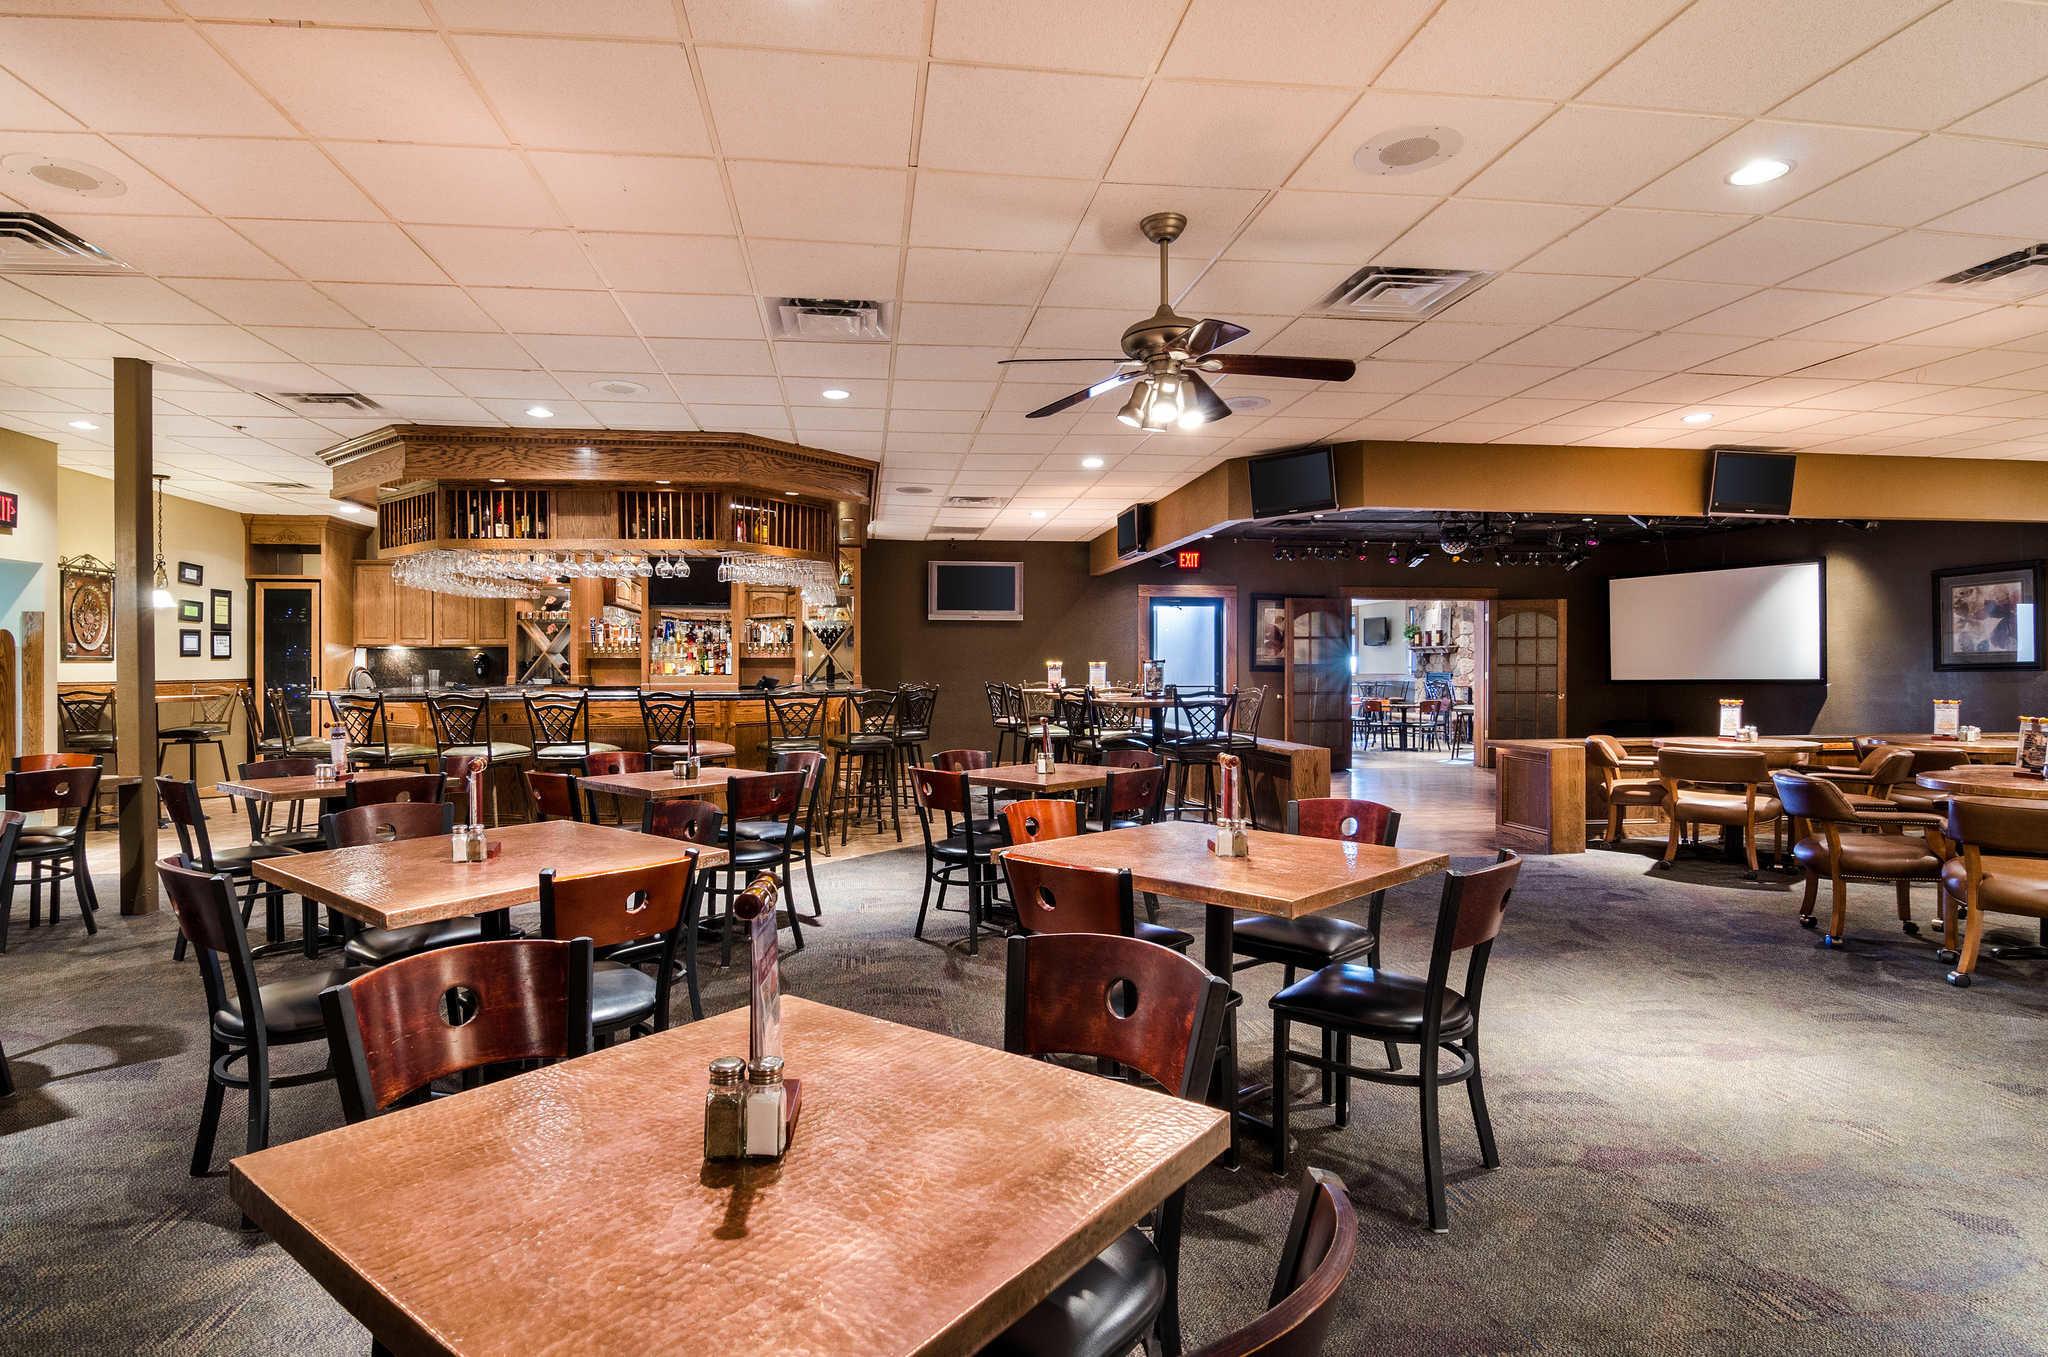 Clarion Inn - Garden City, KS - Business Page